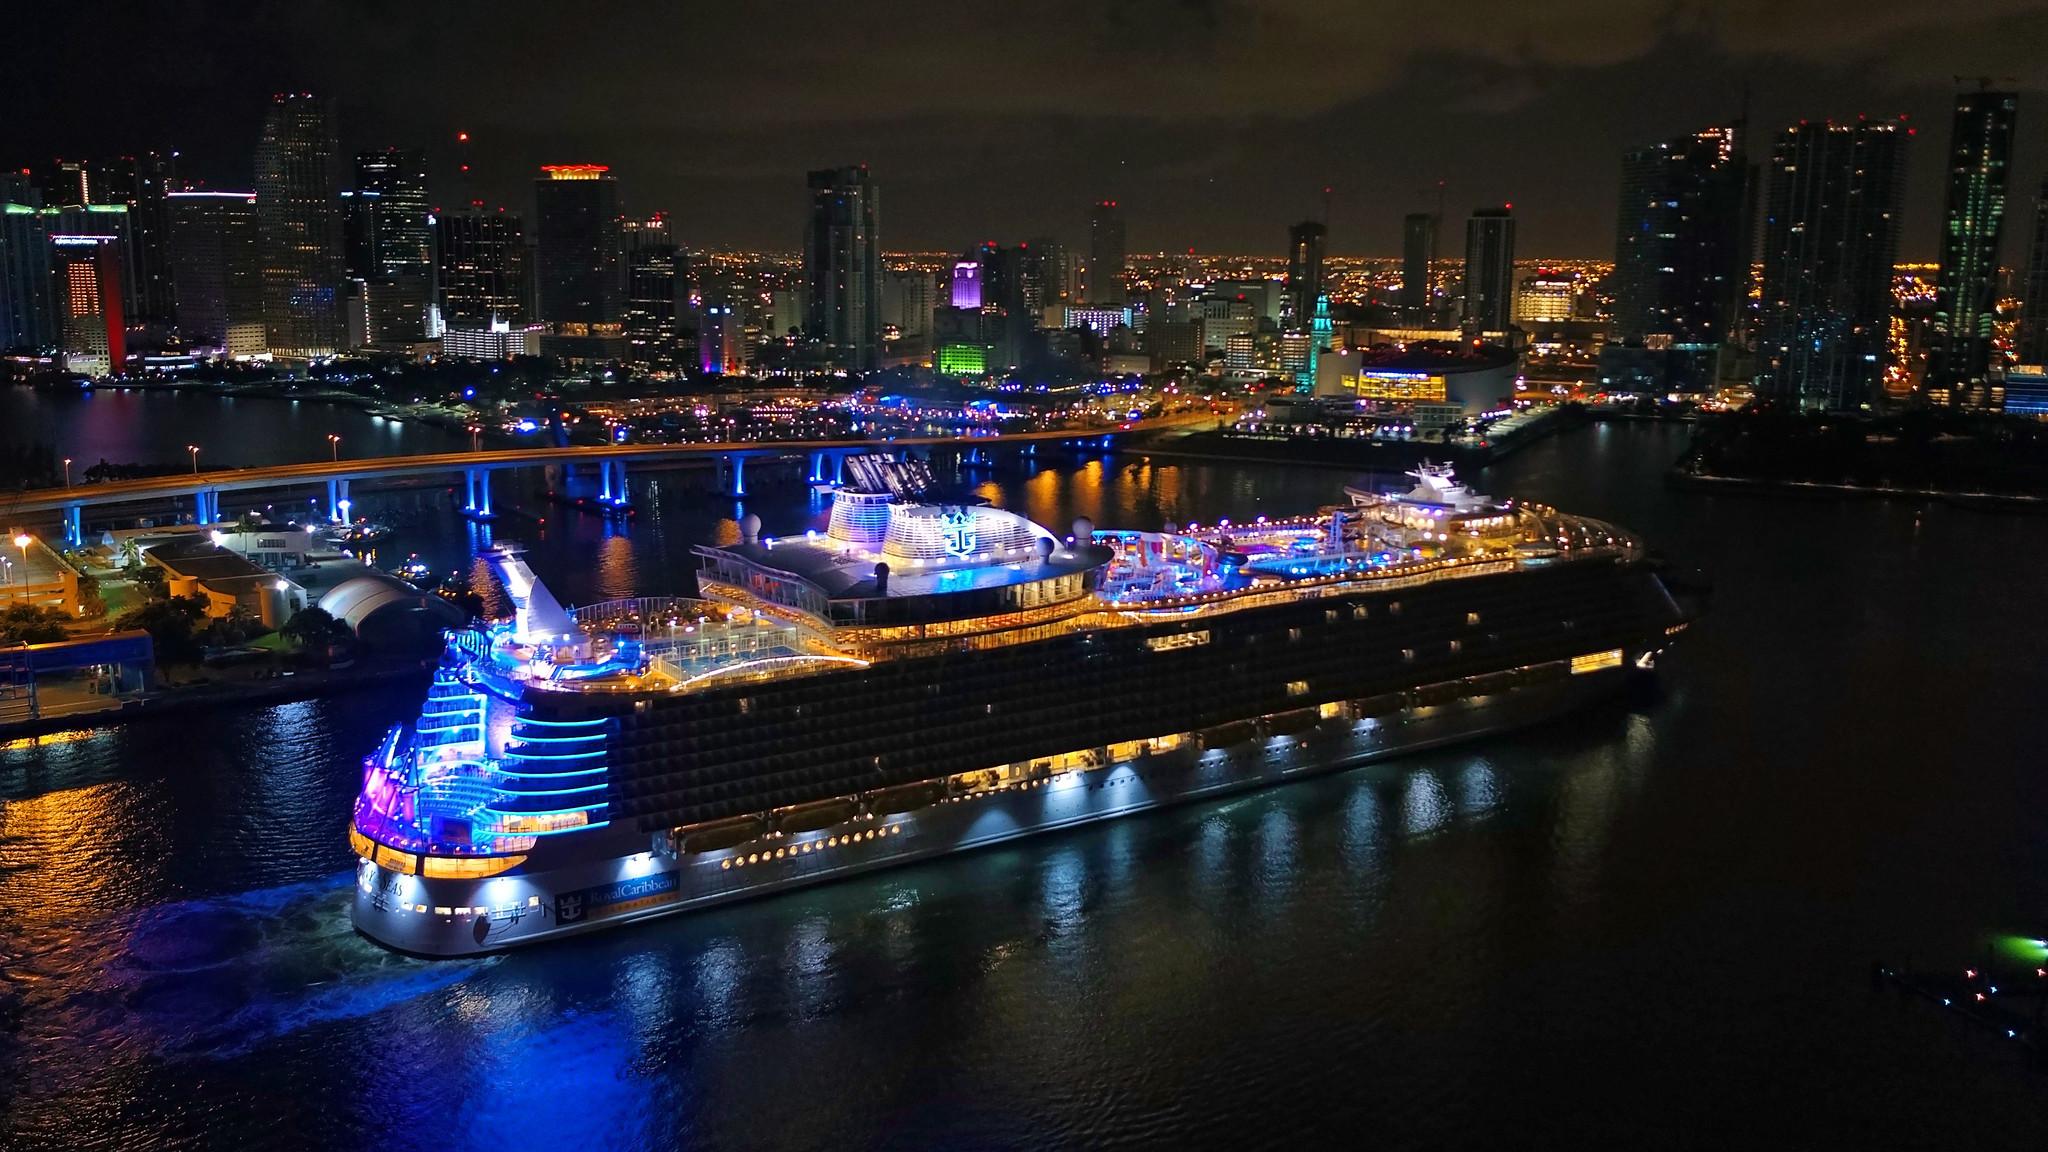 Royal Caribbean orders sixth Oasis-class ship